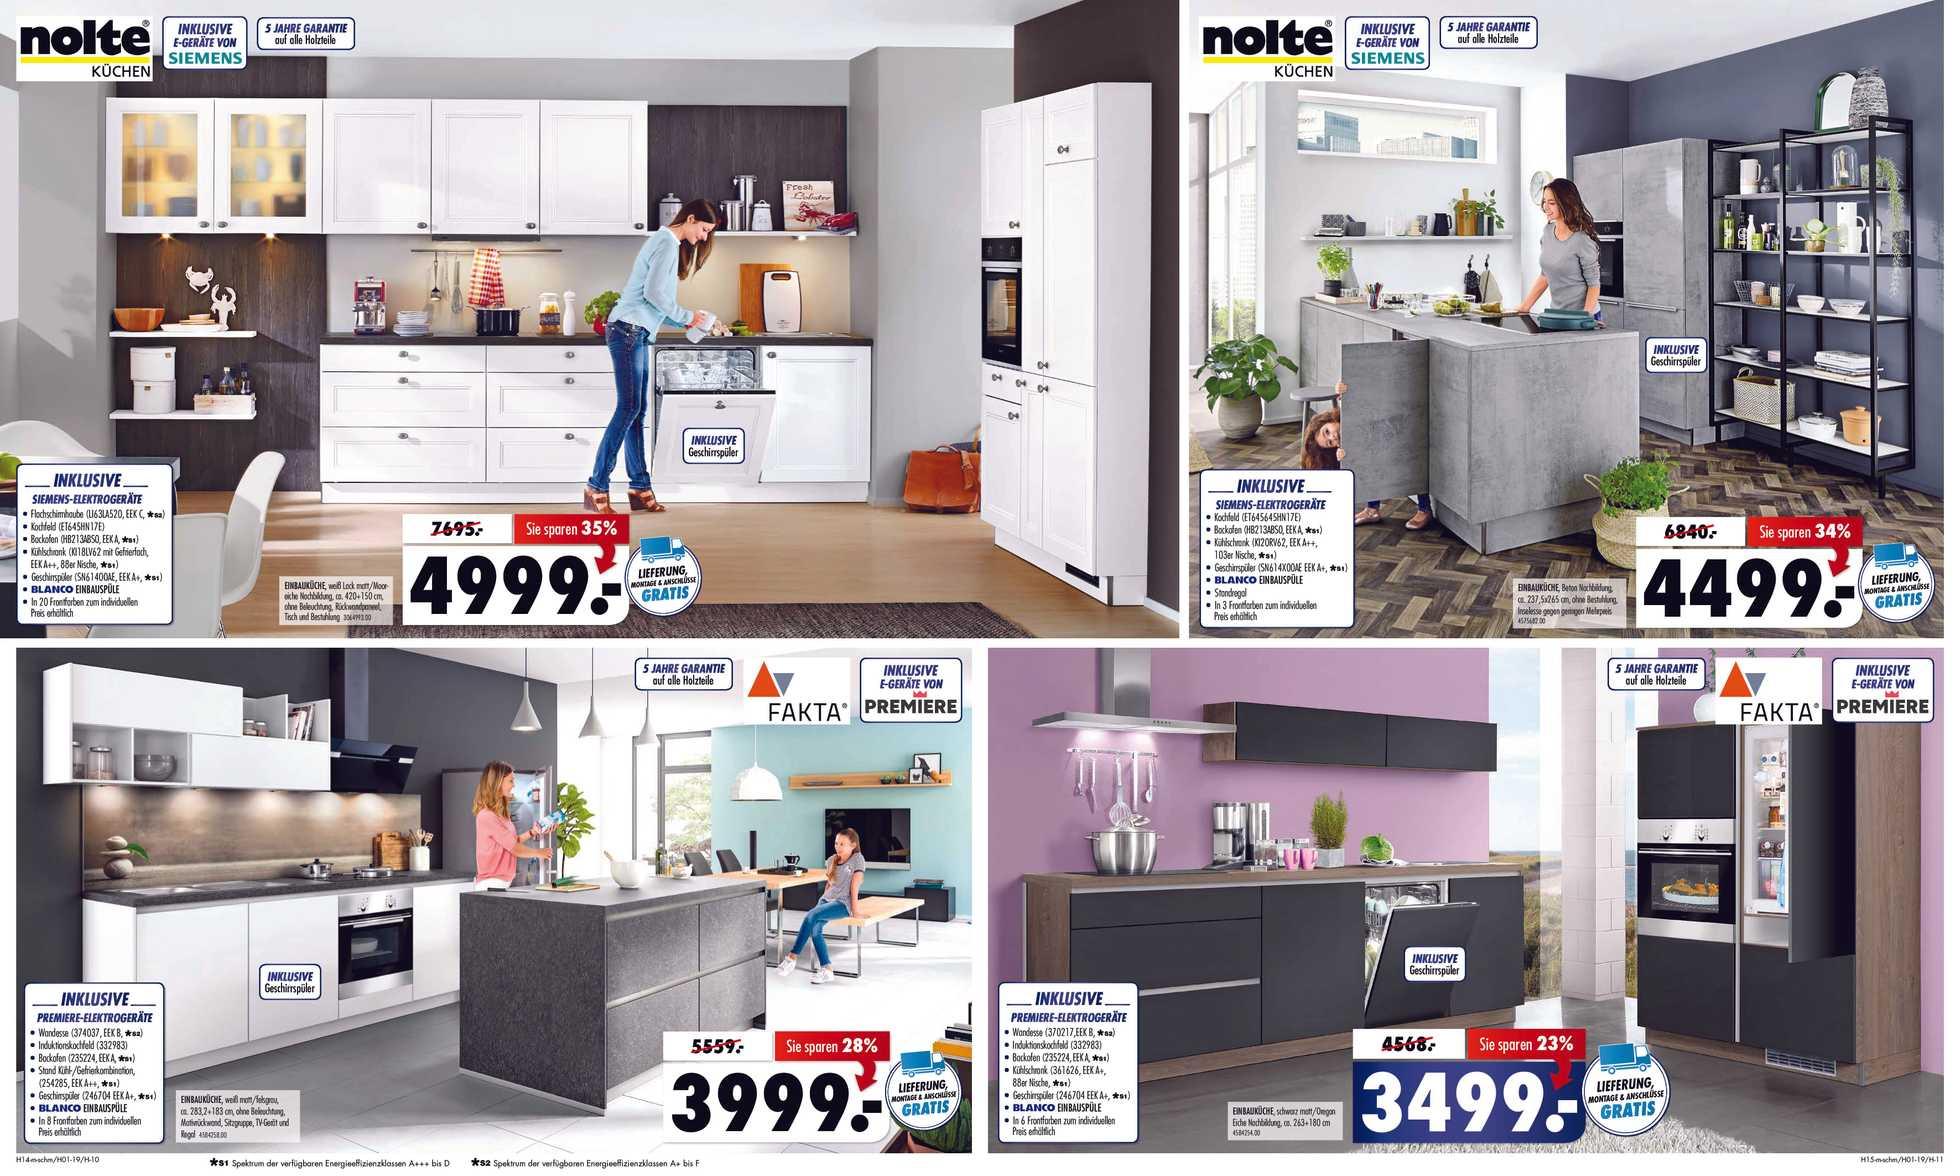 Möbel Hausmann - NEWSPAPERS_singleNewspaper_alt_presentationSliderItem_startAt 2019-01-22 - seite 4